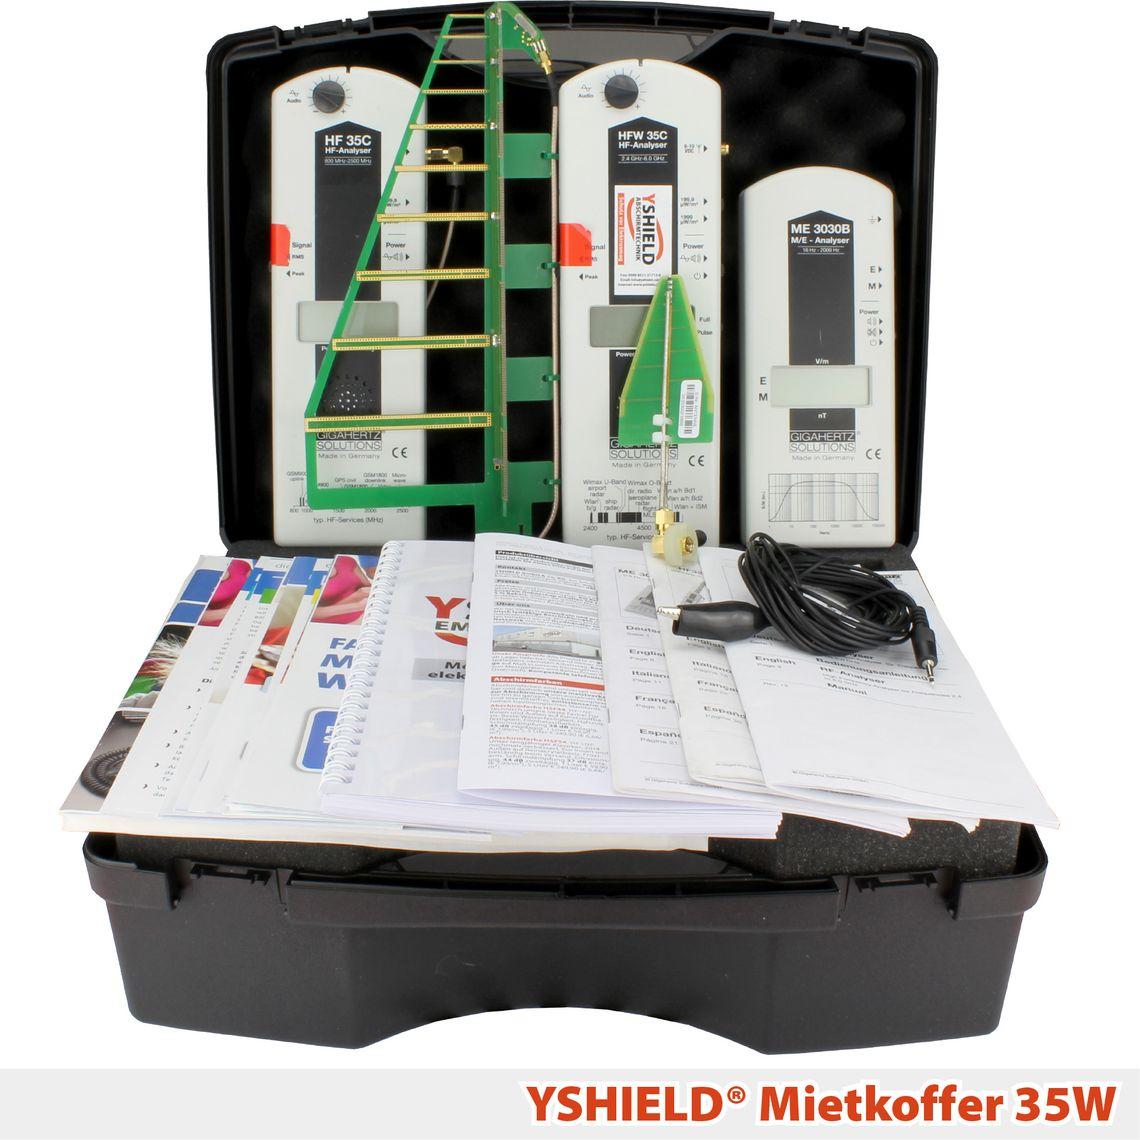 YSHIELD® 35W   Mietkoffer   Miete 7 Tage